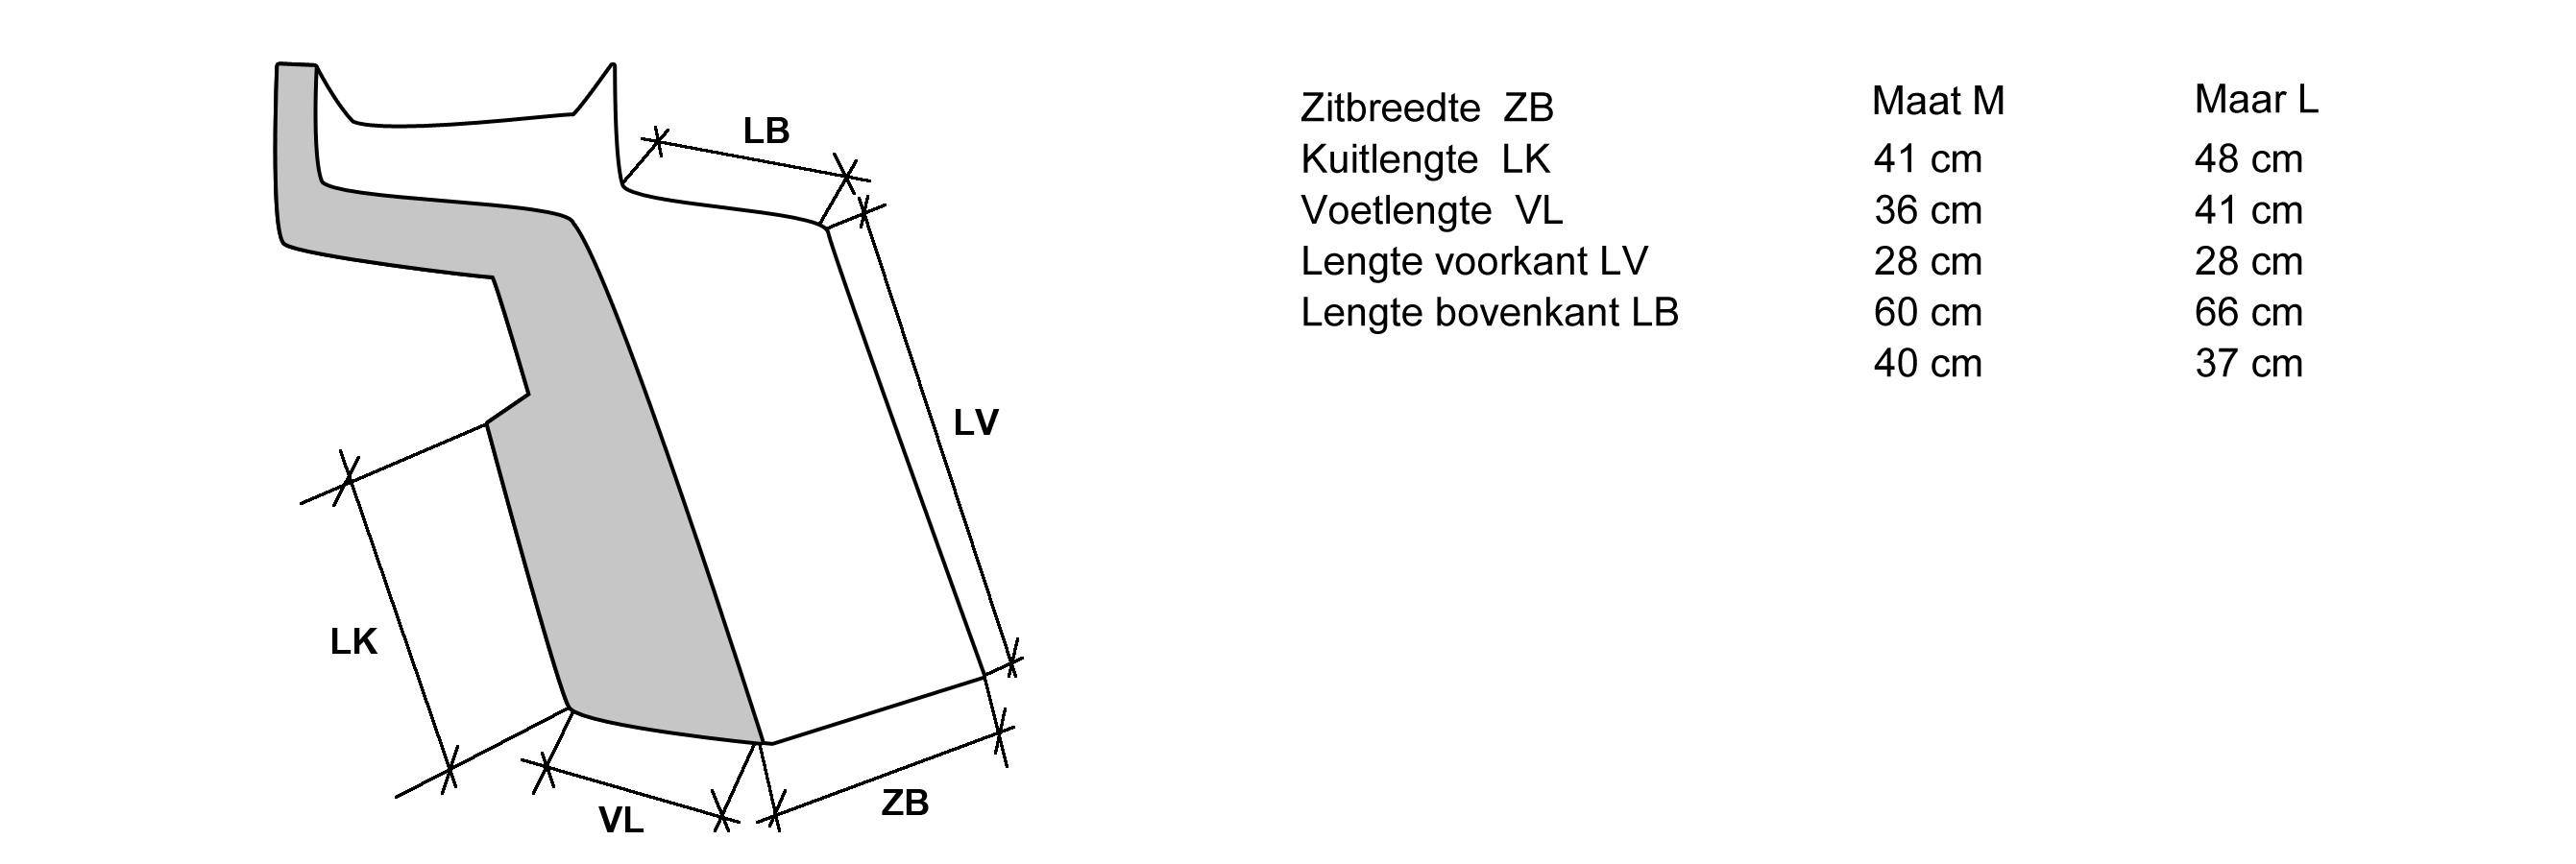 l-nge-der-decken568e2e7ad48b1